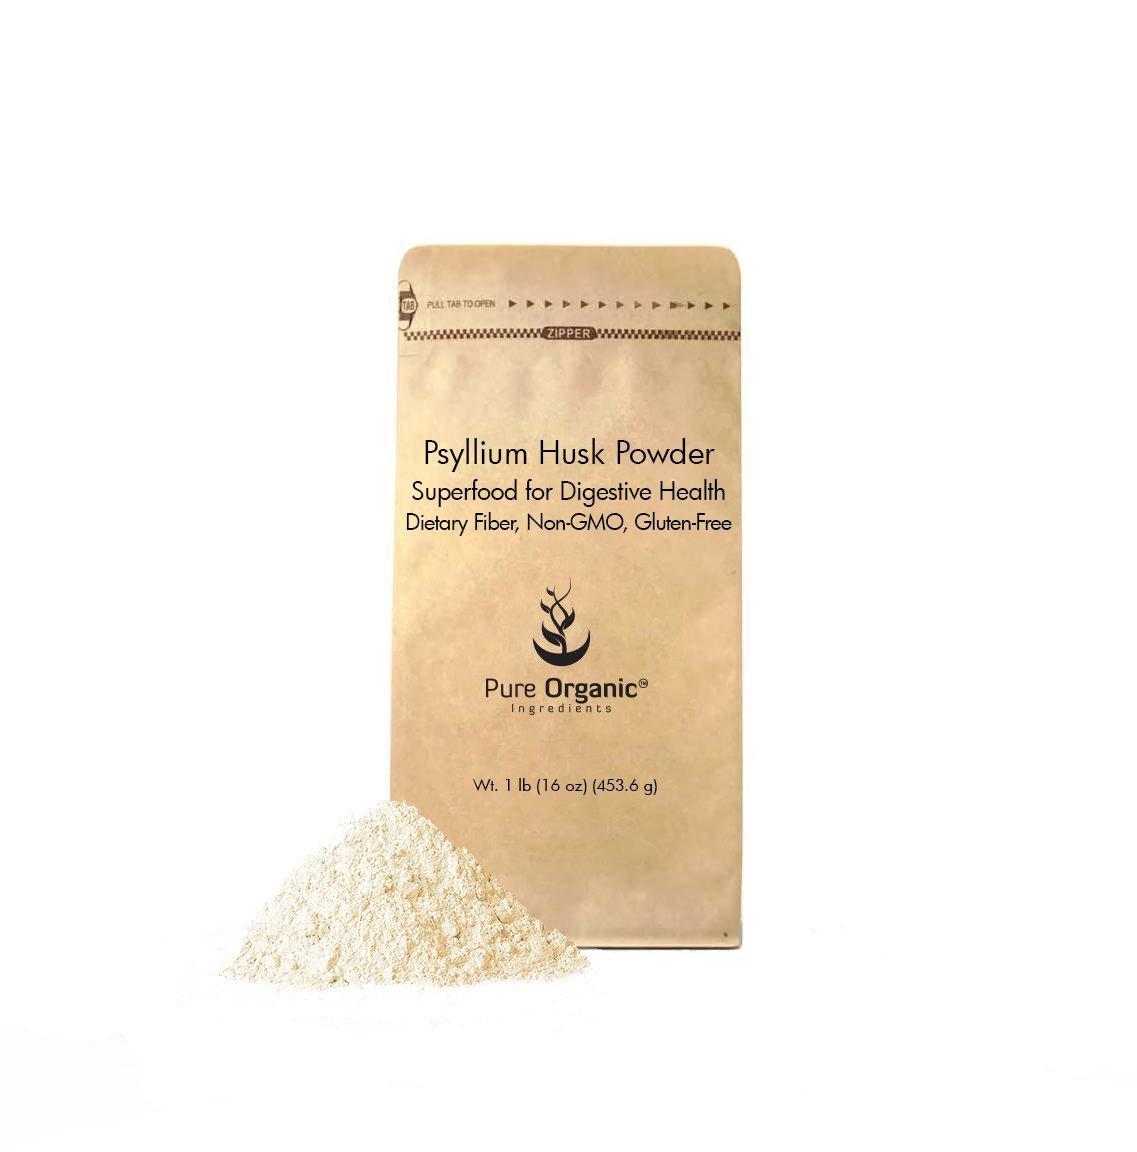 Psyllium Husk Powder by Pure Organic Ingredients, Fiber Powder Supplement, Additive for Gluten-Free Baking (1 lb)